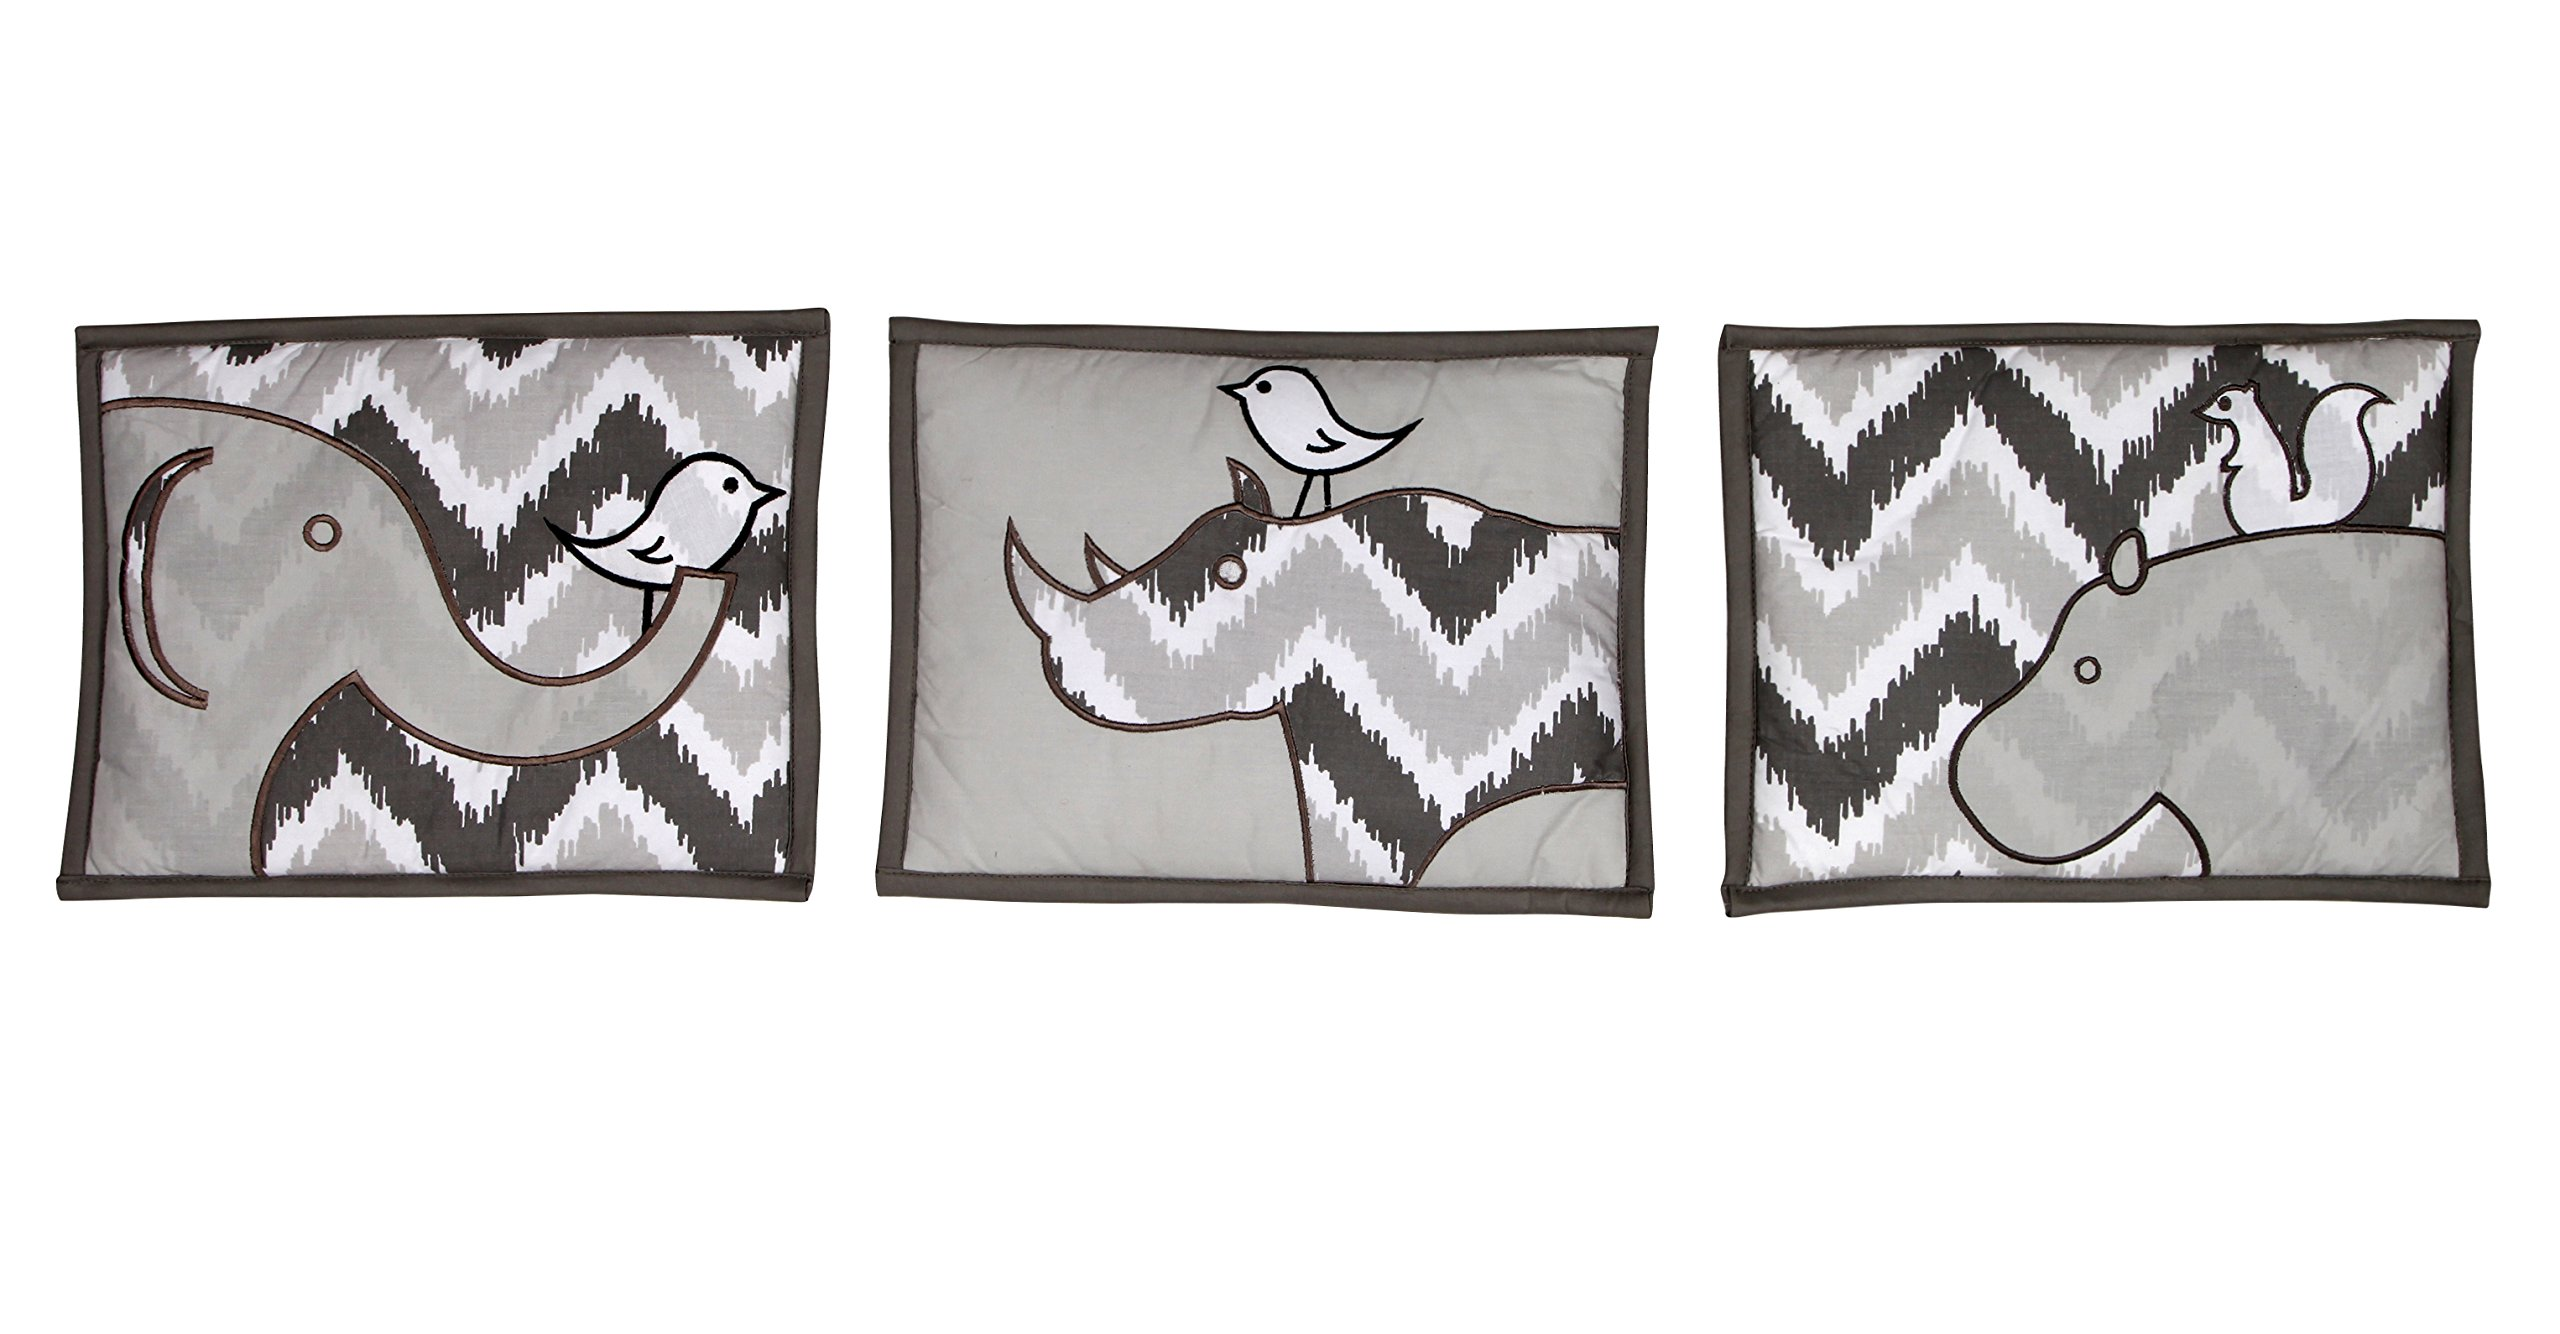 Bacati Ikat Chevron 10 Piece Crib Set with Bumper Pad, Coral/Grey by Bacati (Image #1)